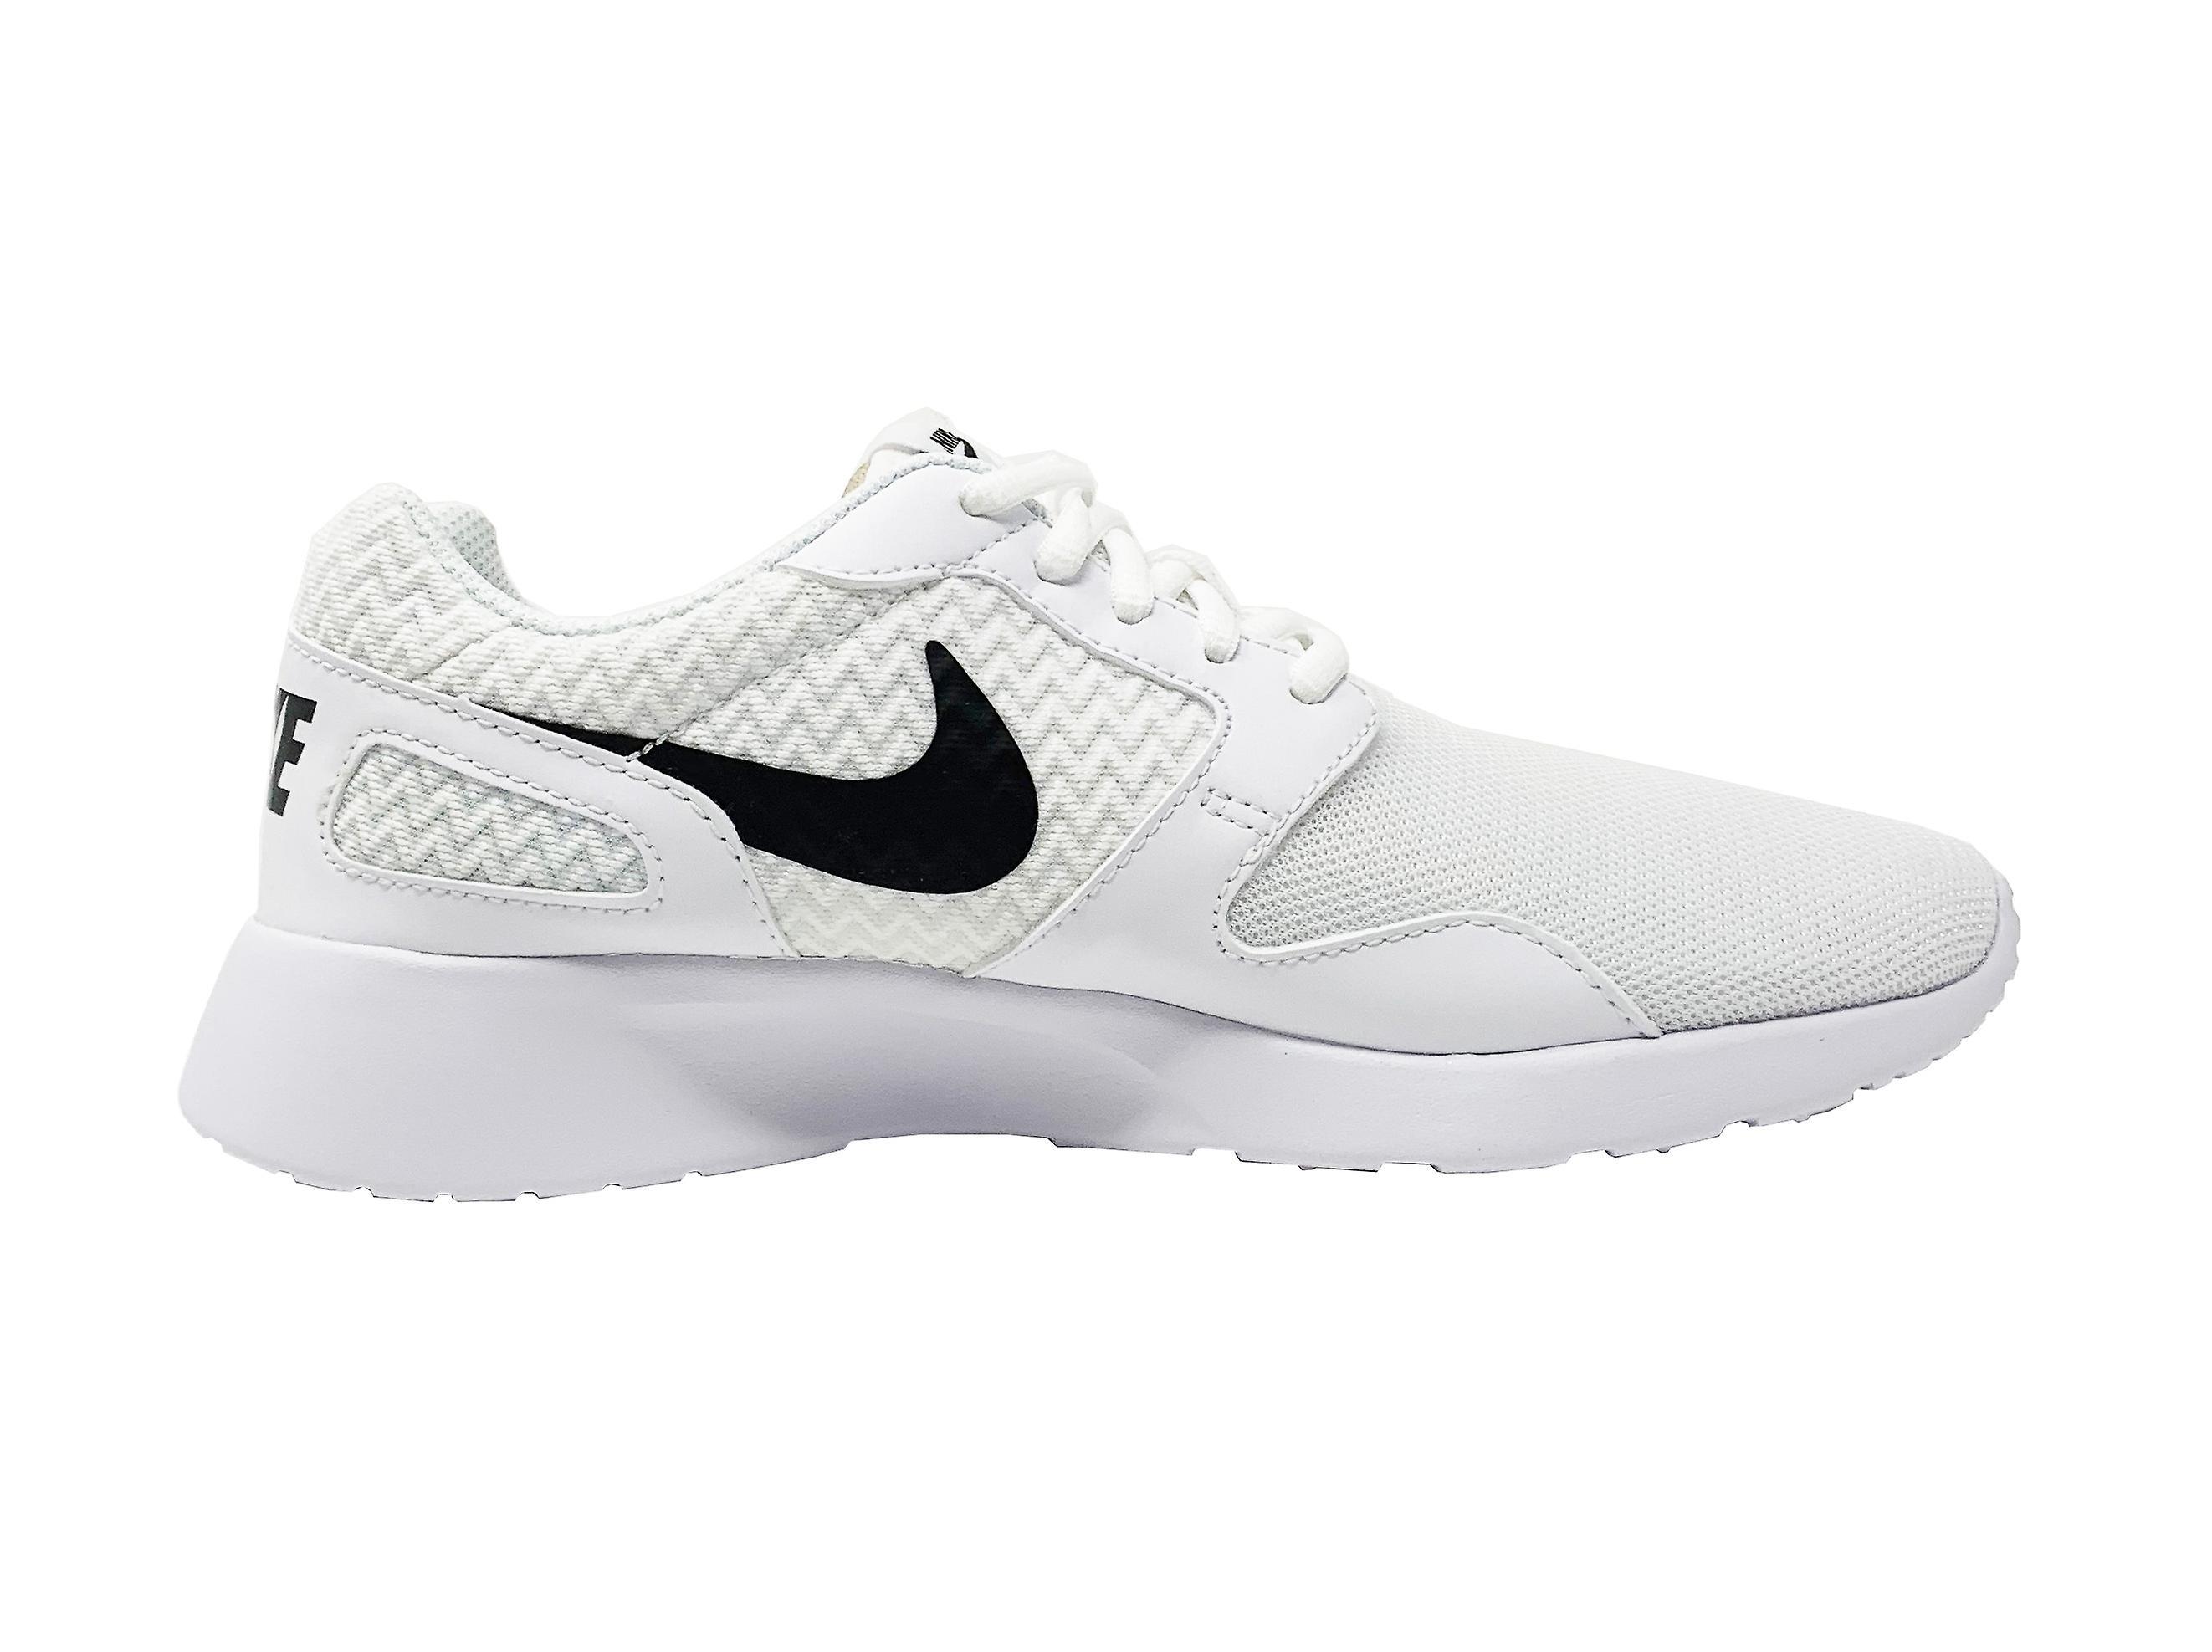 separation shoes 788de 01064 Nike Kaishi 654845 103 Womens Trainers